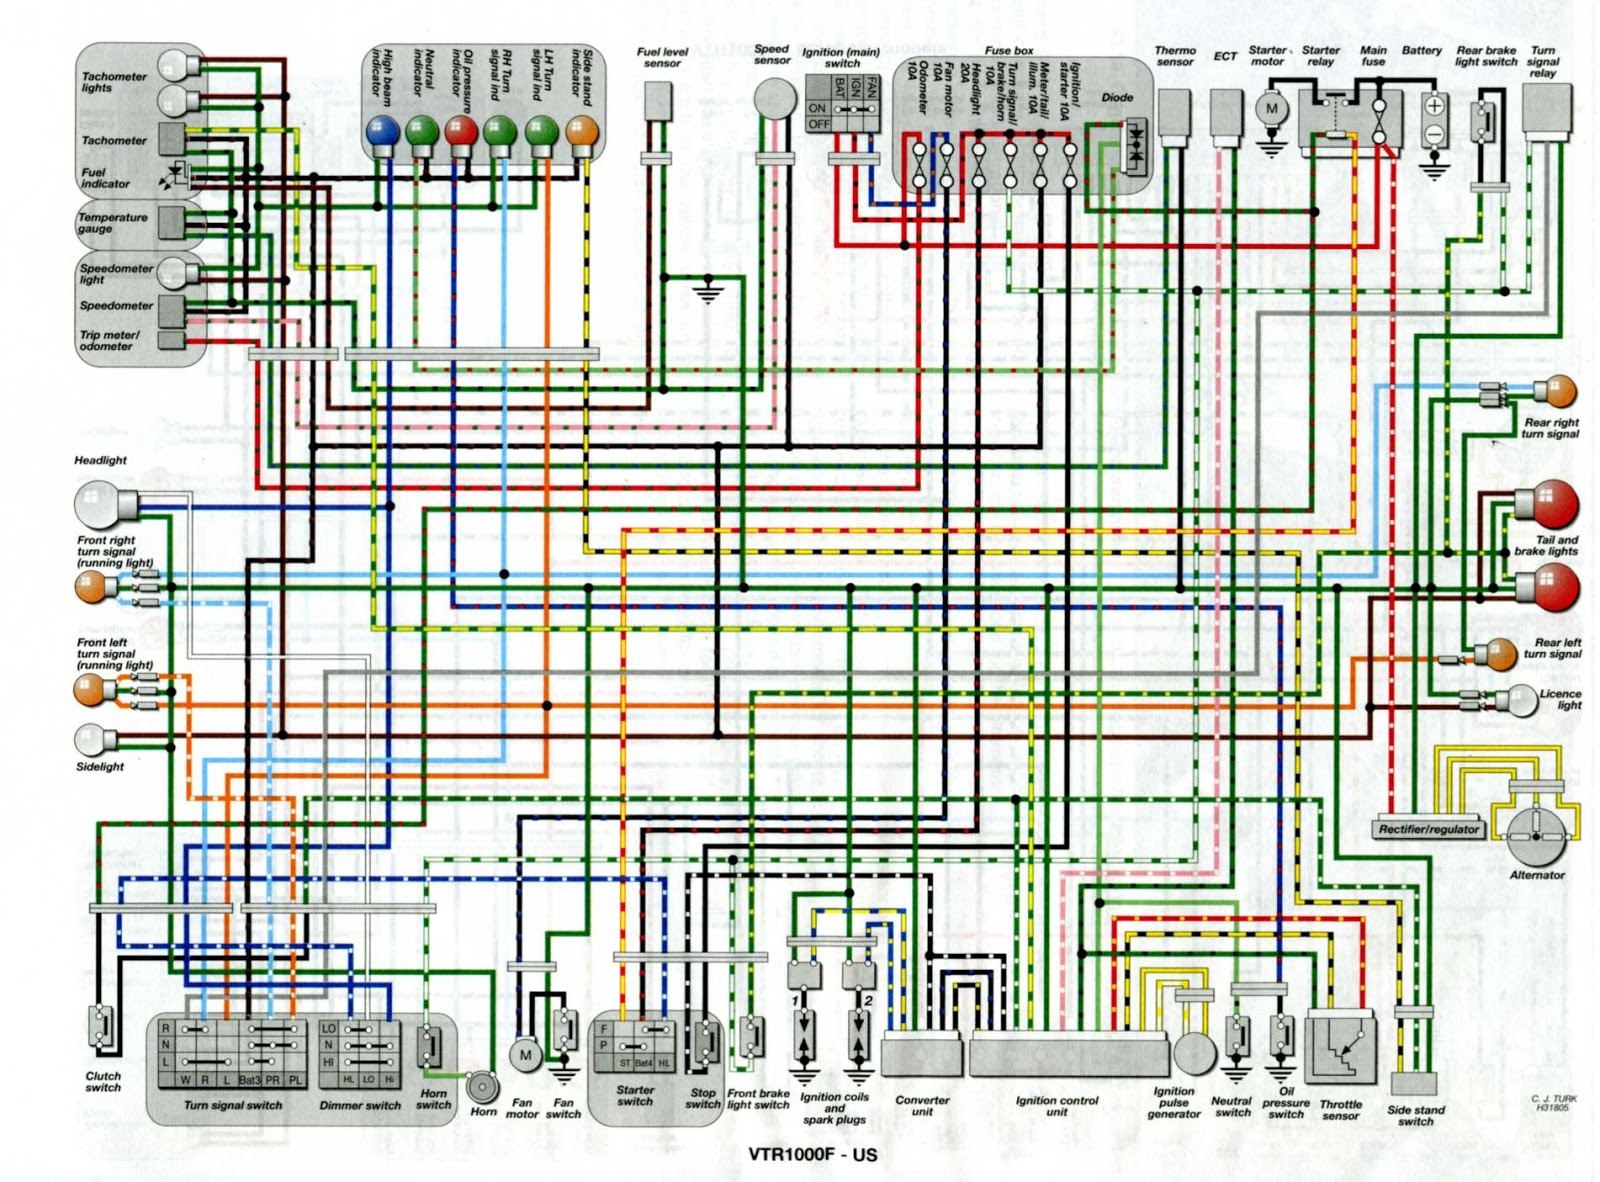 Honda Z50 K2 Wiring Diagram Electrical Diagrams Z50r 1970 Schematics And 50